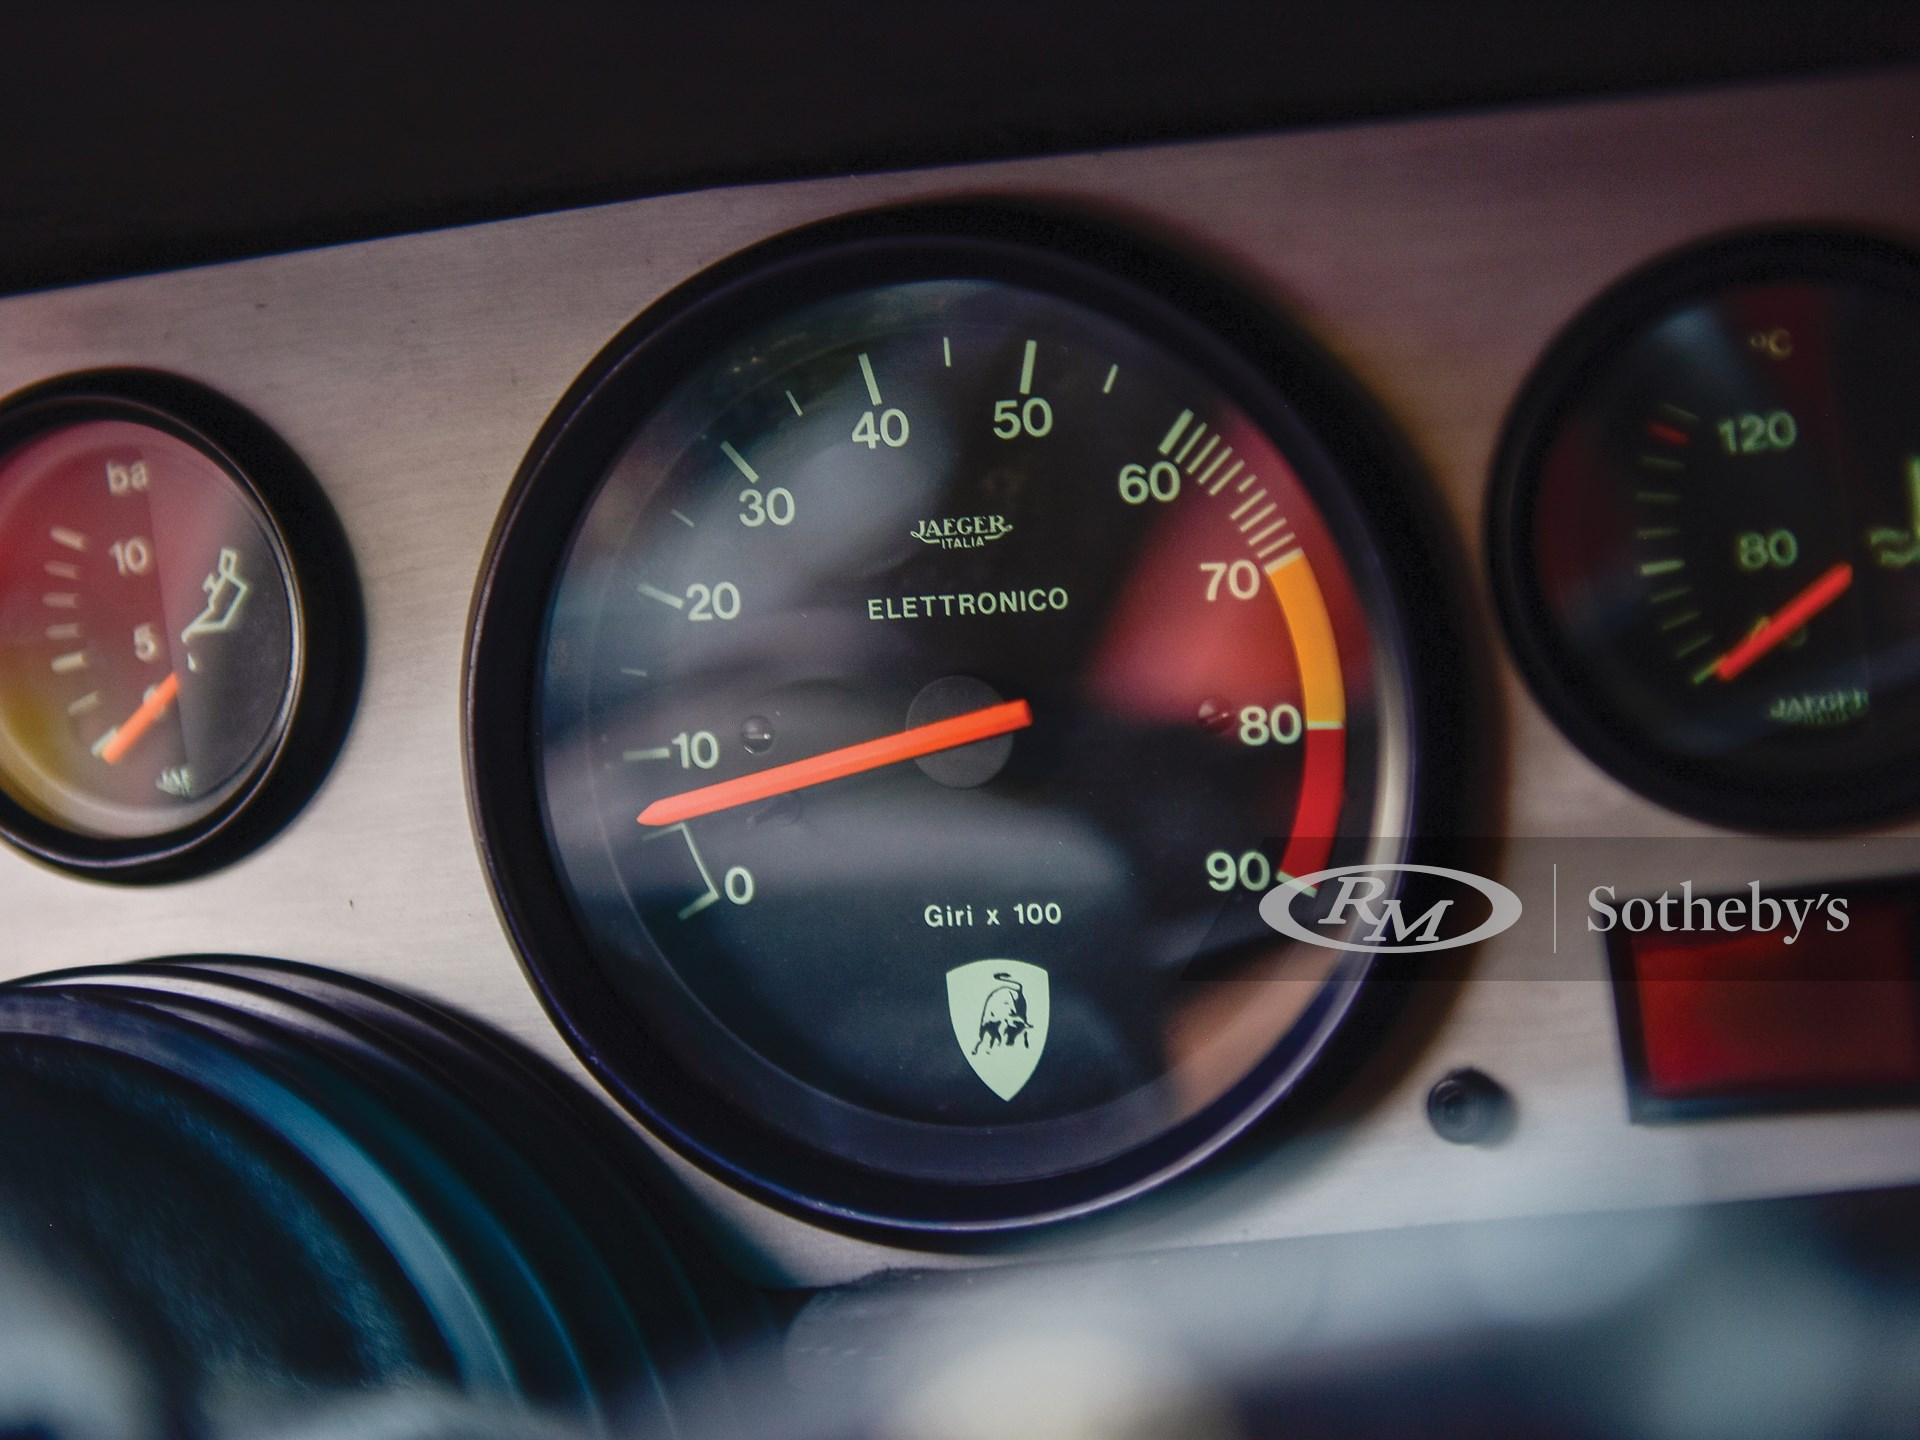 1981 Lamborghini Countach LP400 S Series II by Bertone -